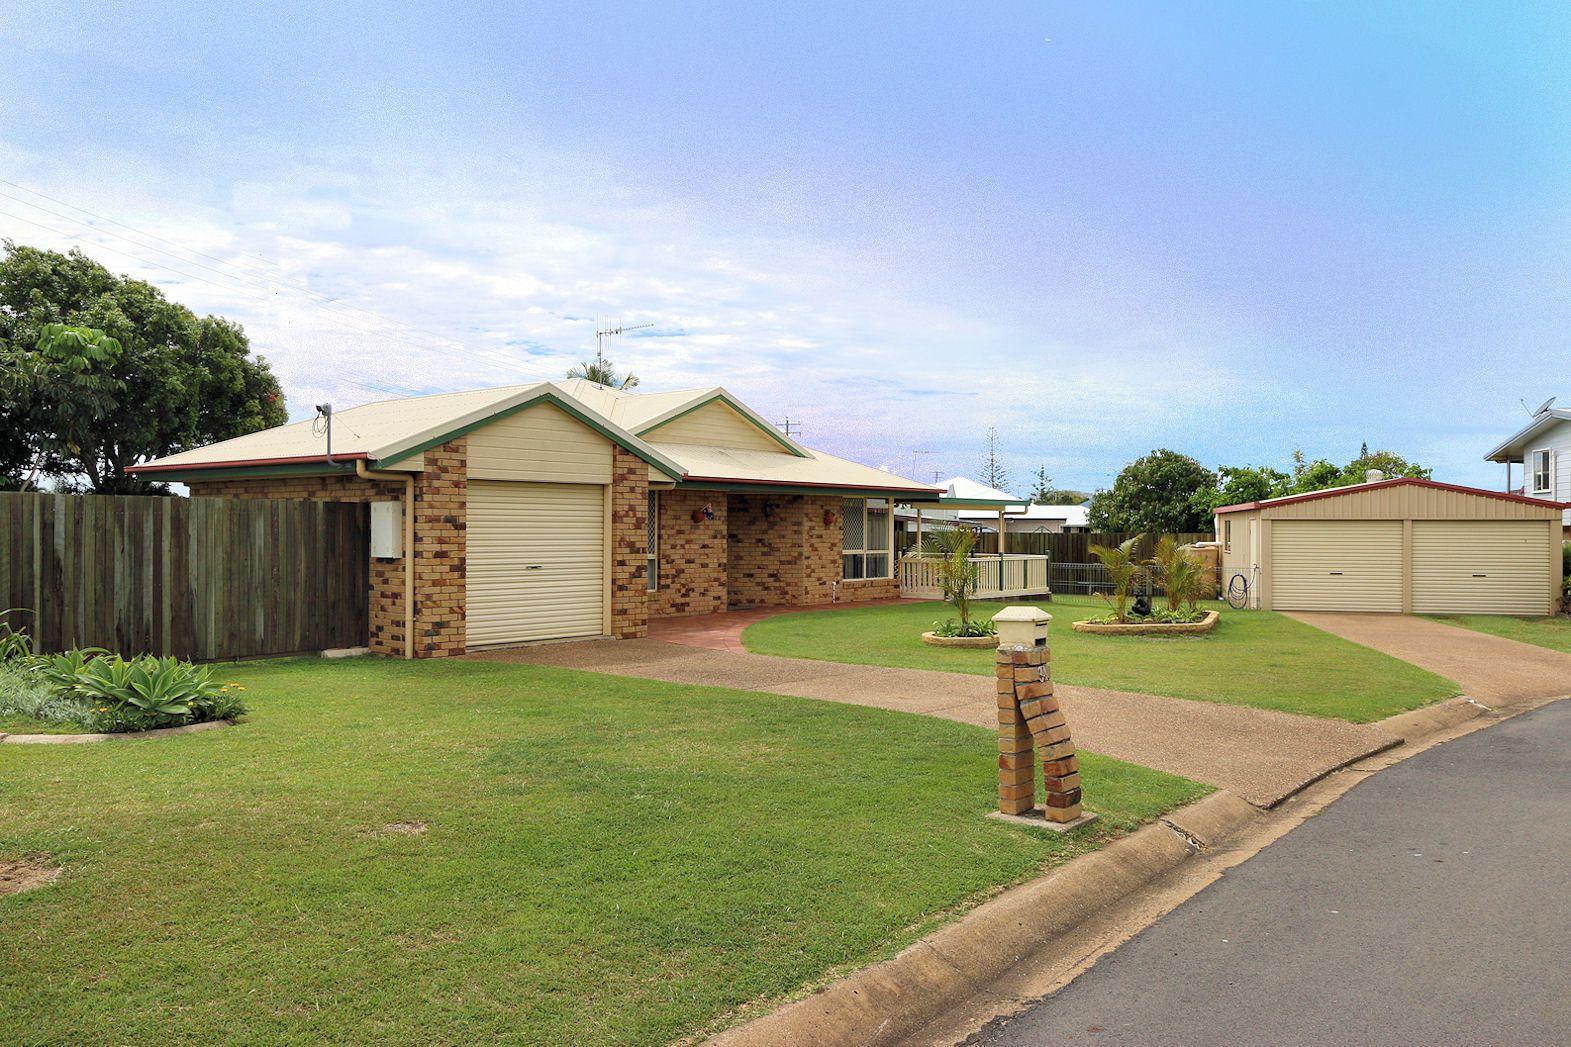 34 Innes Park Rd, Innes Park QLD 4670, Image 1